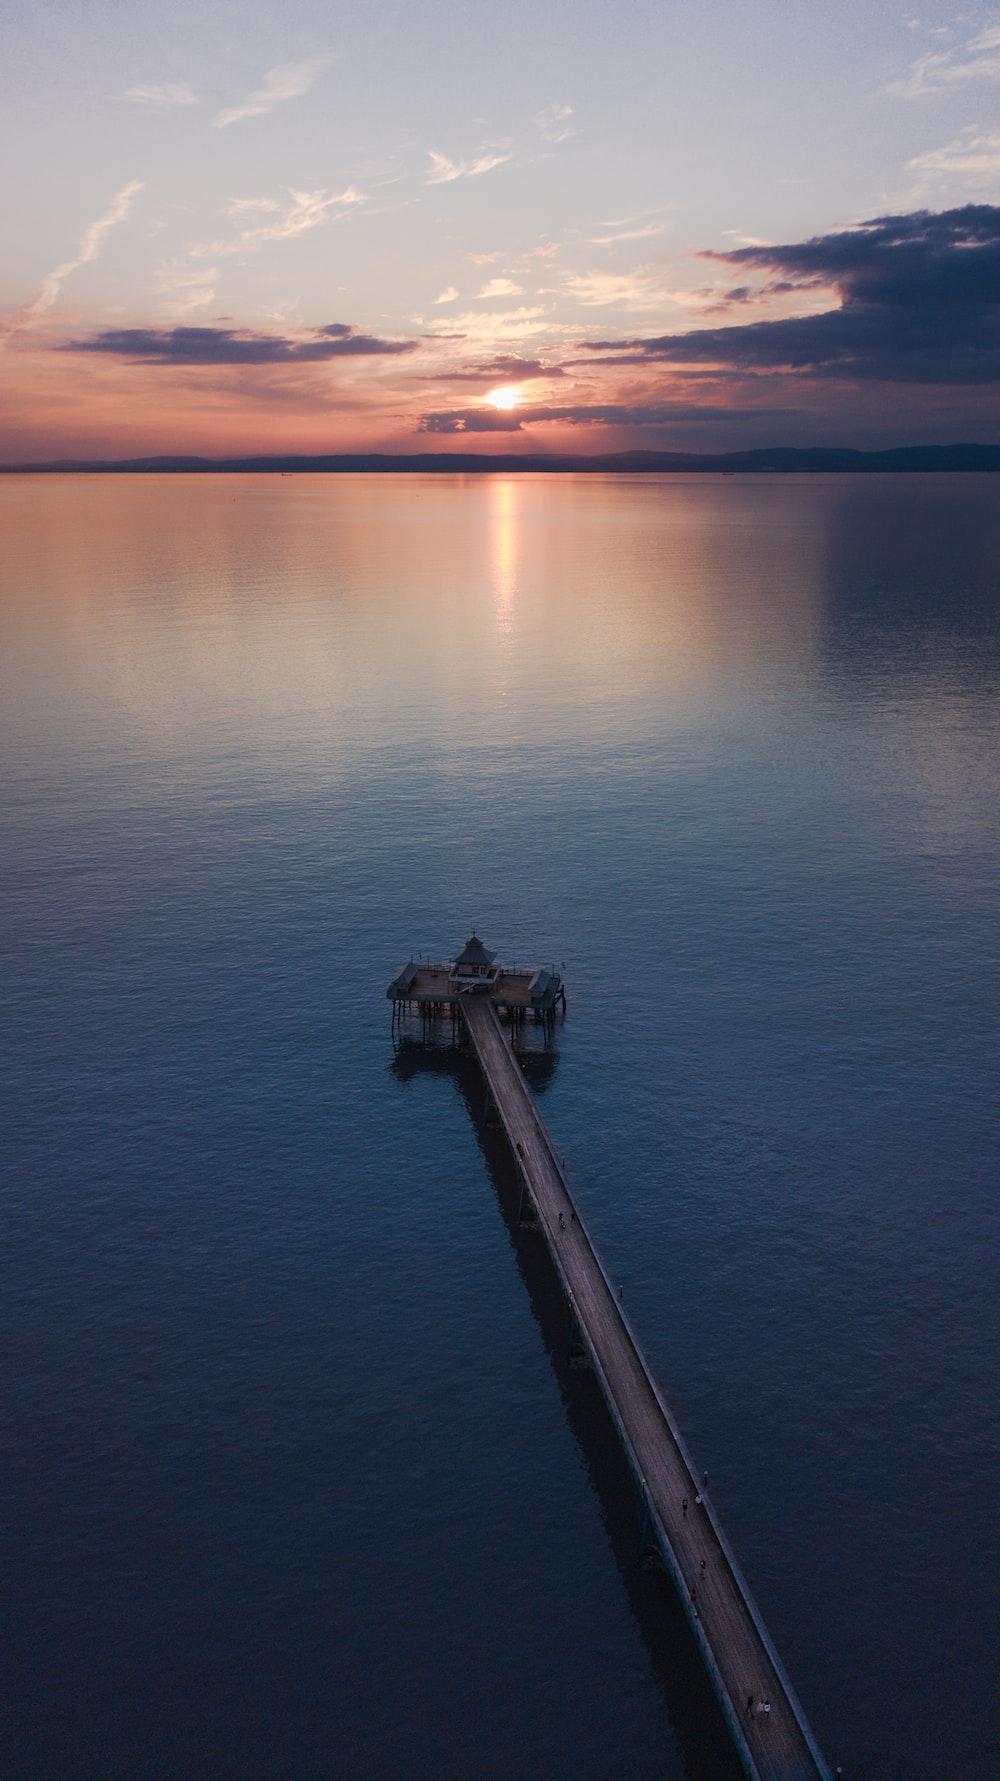 brown wooden pier dock on body of water during golden hour